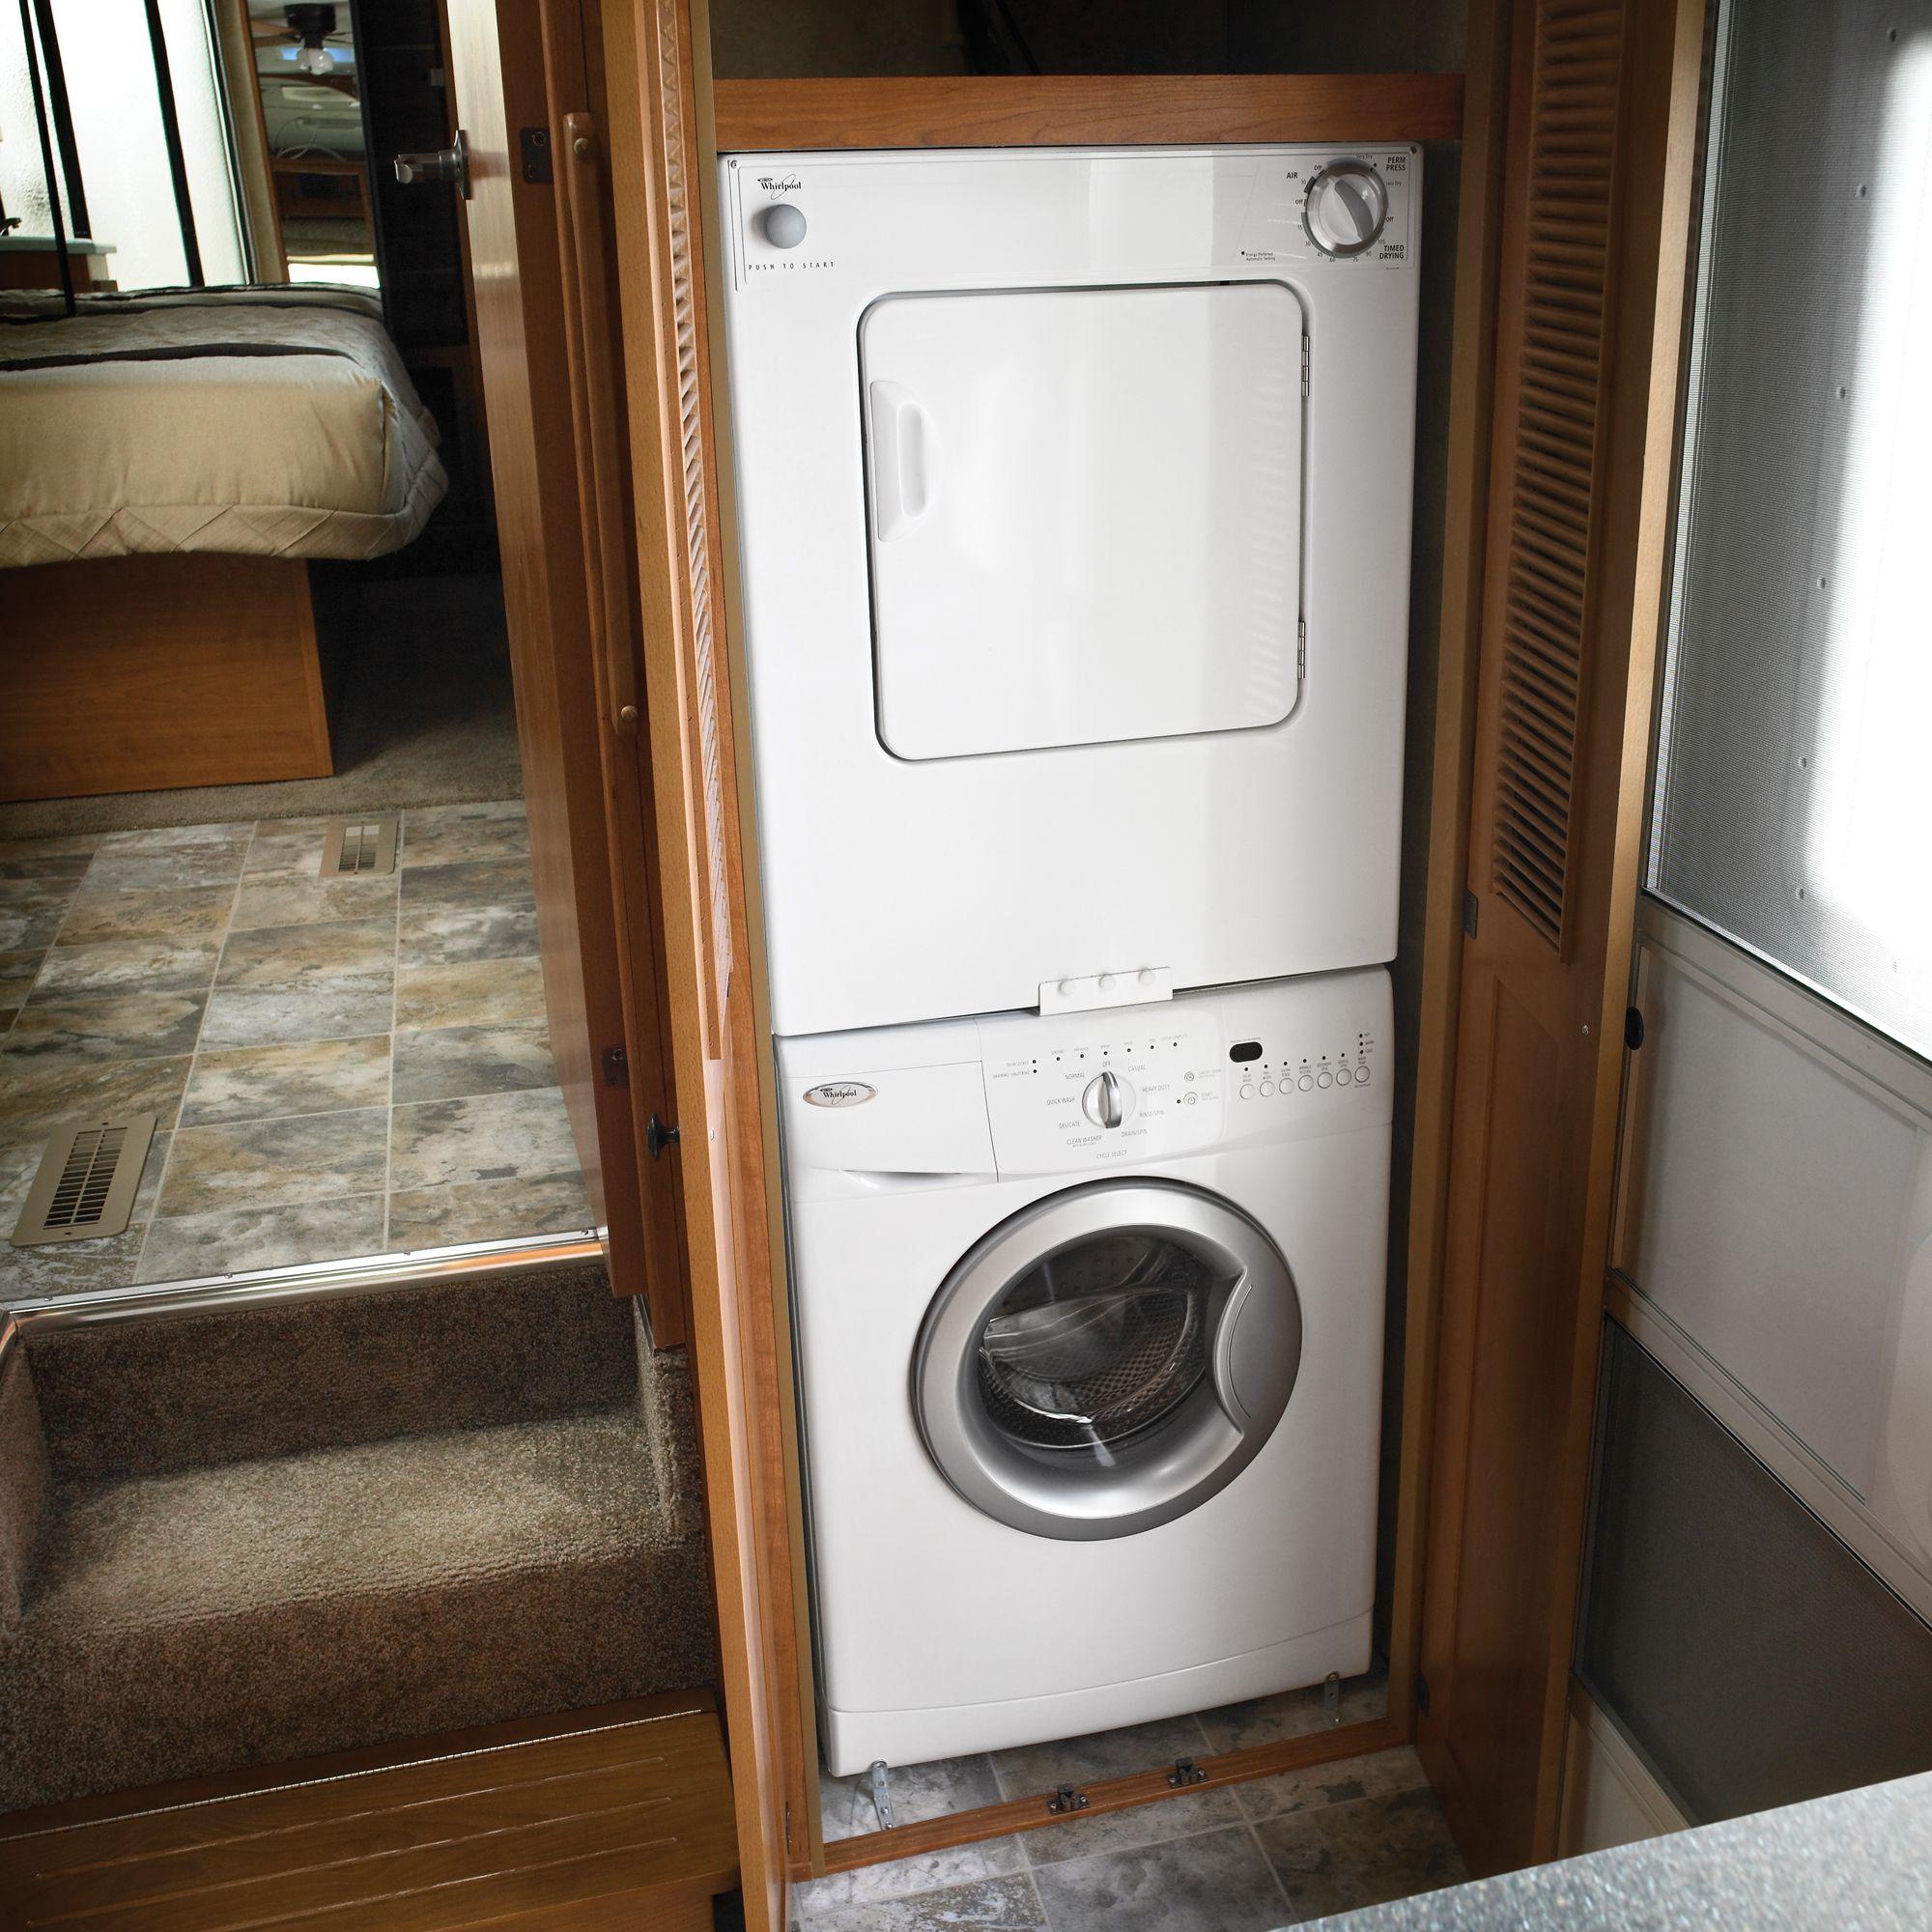 Whirlpool LDR3822PQ 3.4 cu. ft. 120V Electric Dryer - White